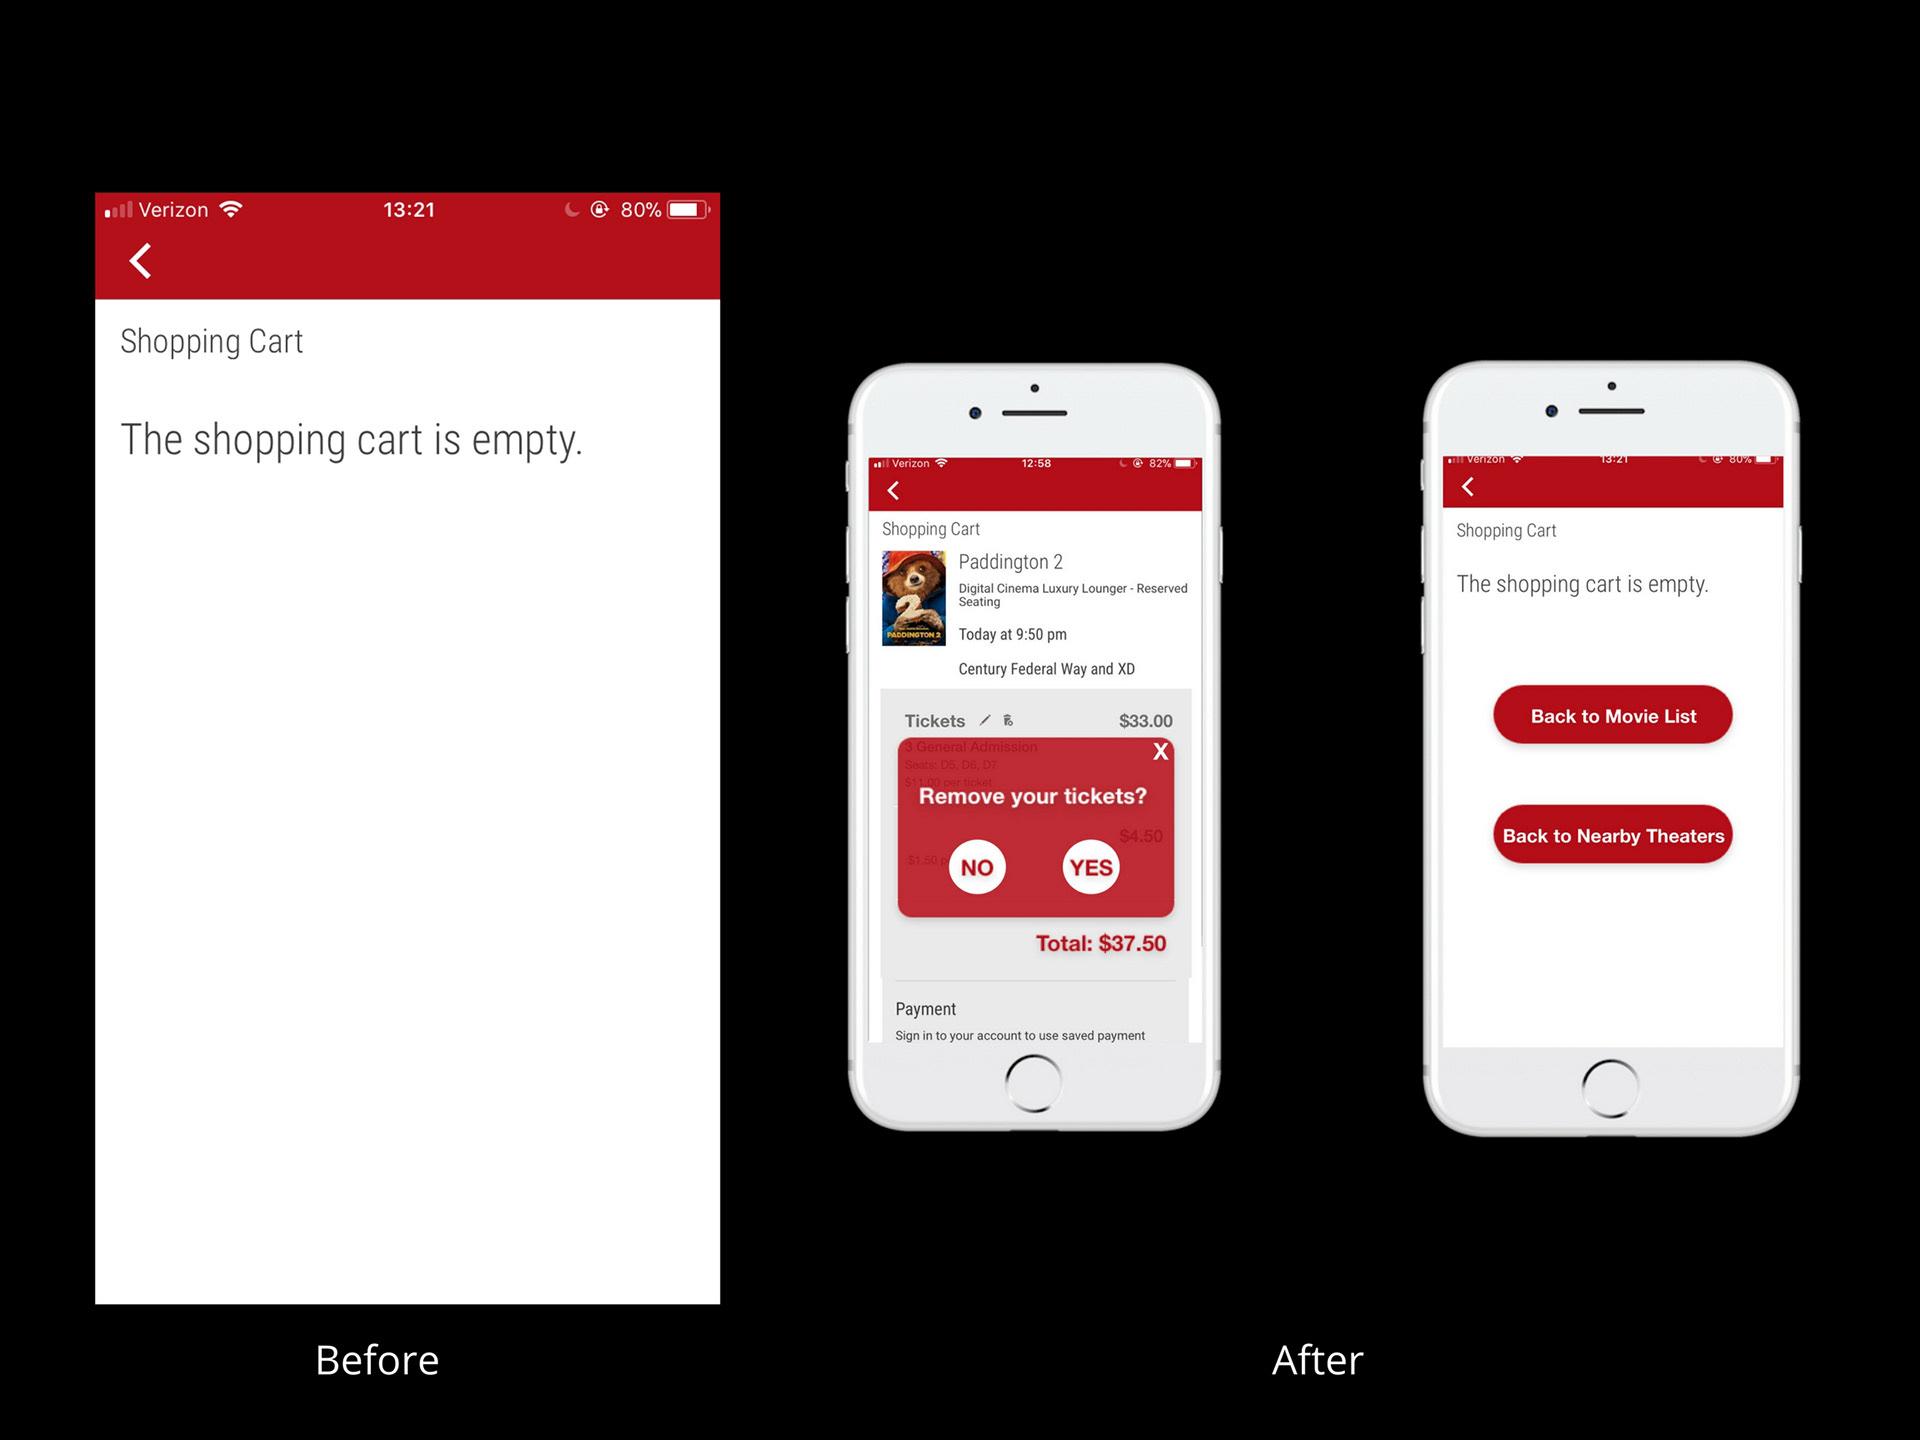 Yan Liu - Cinemark Theatres App - Redesign